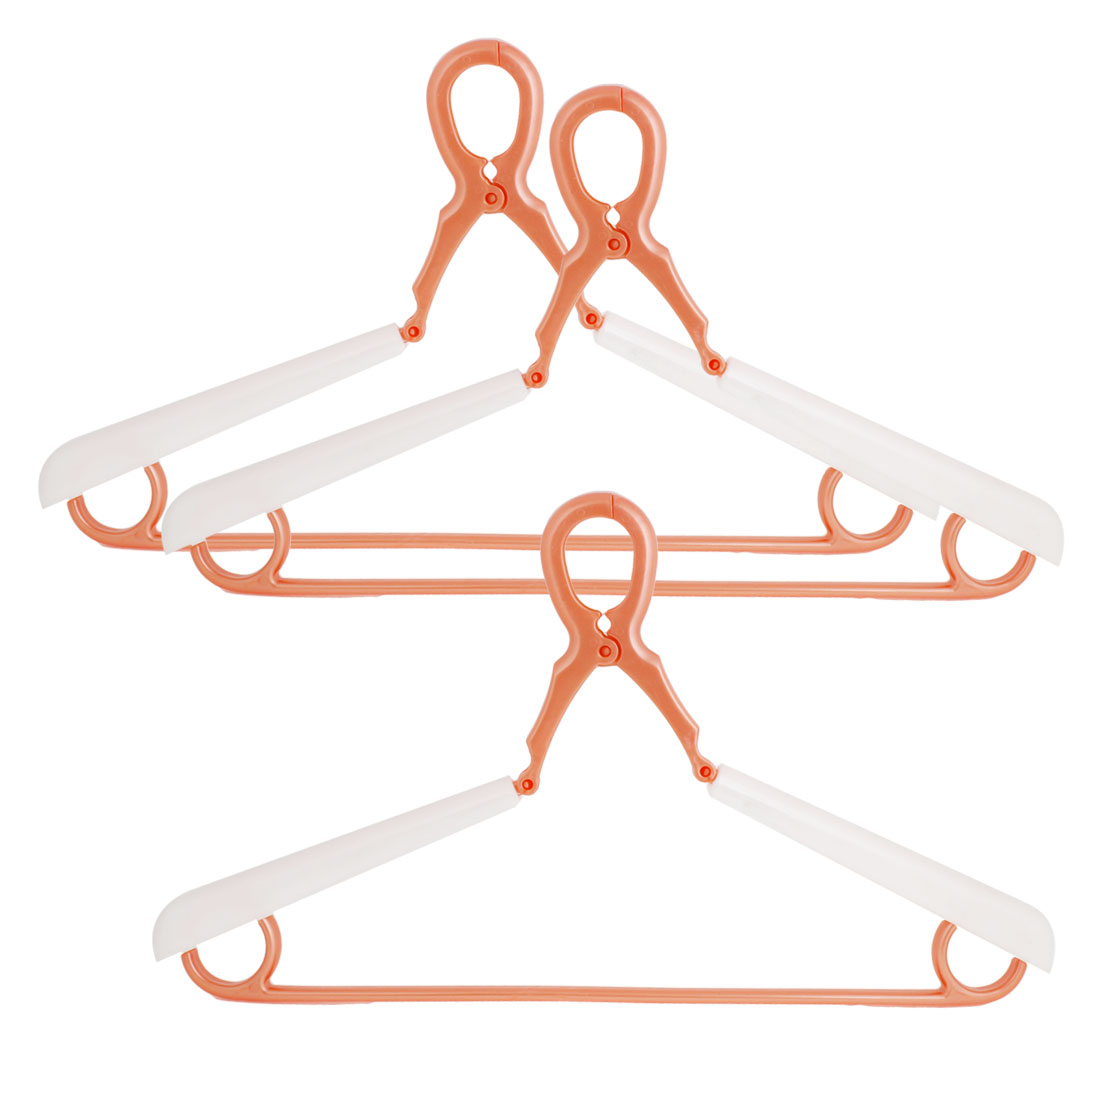 3 Pcs Coat Hanging Orange White Plastic Garment Clothes Hanger